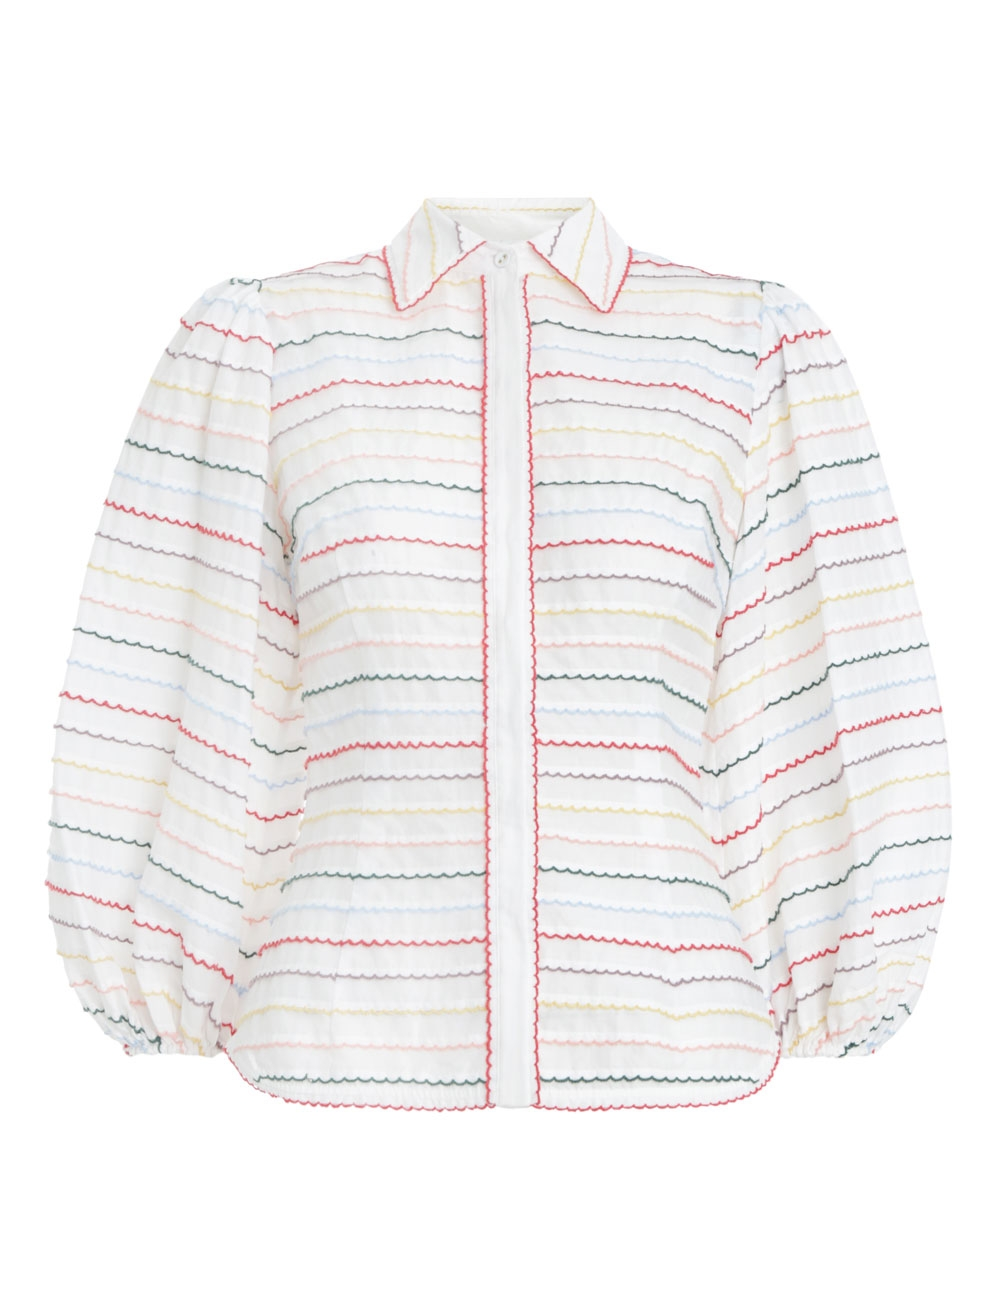 Zinnia Scallop Stripe Shirt